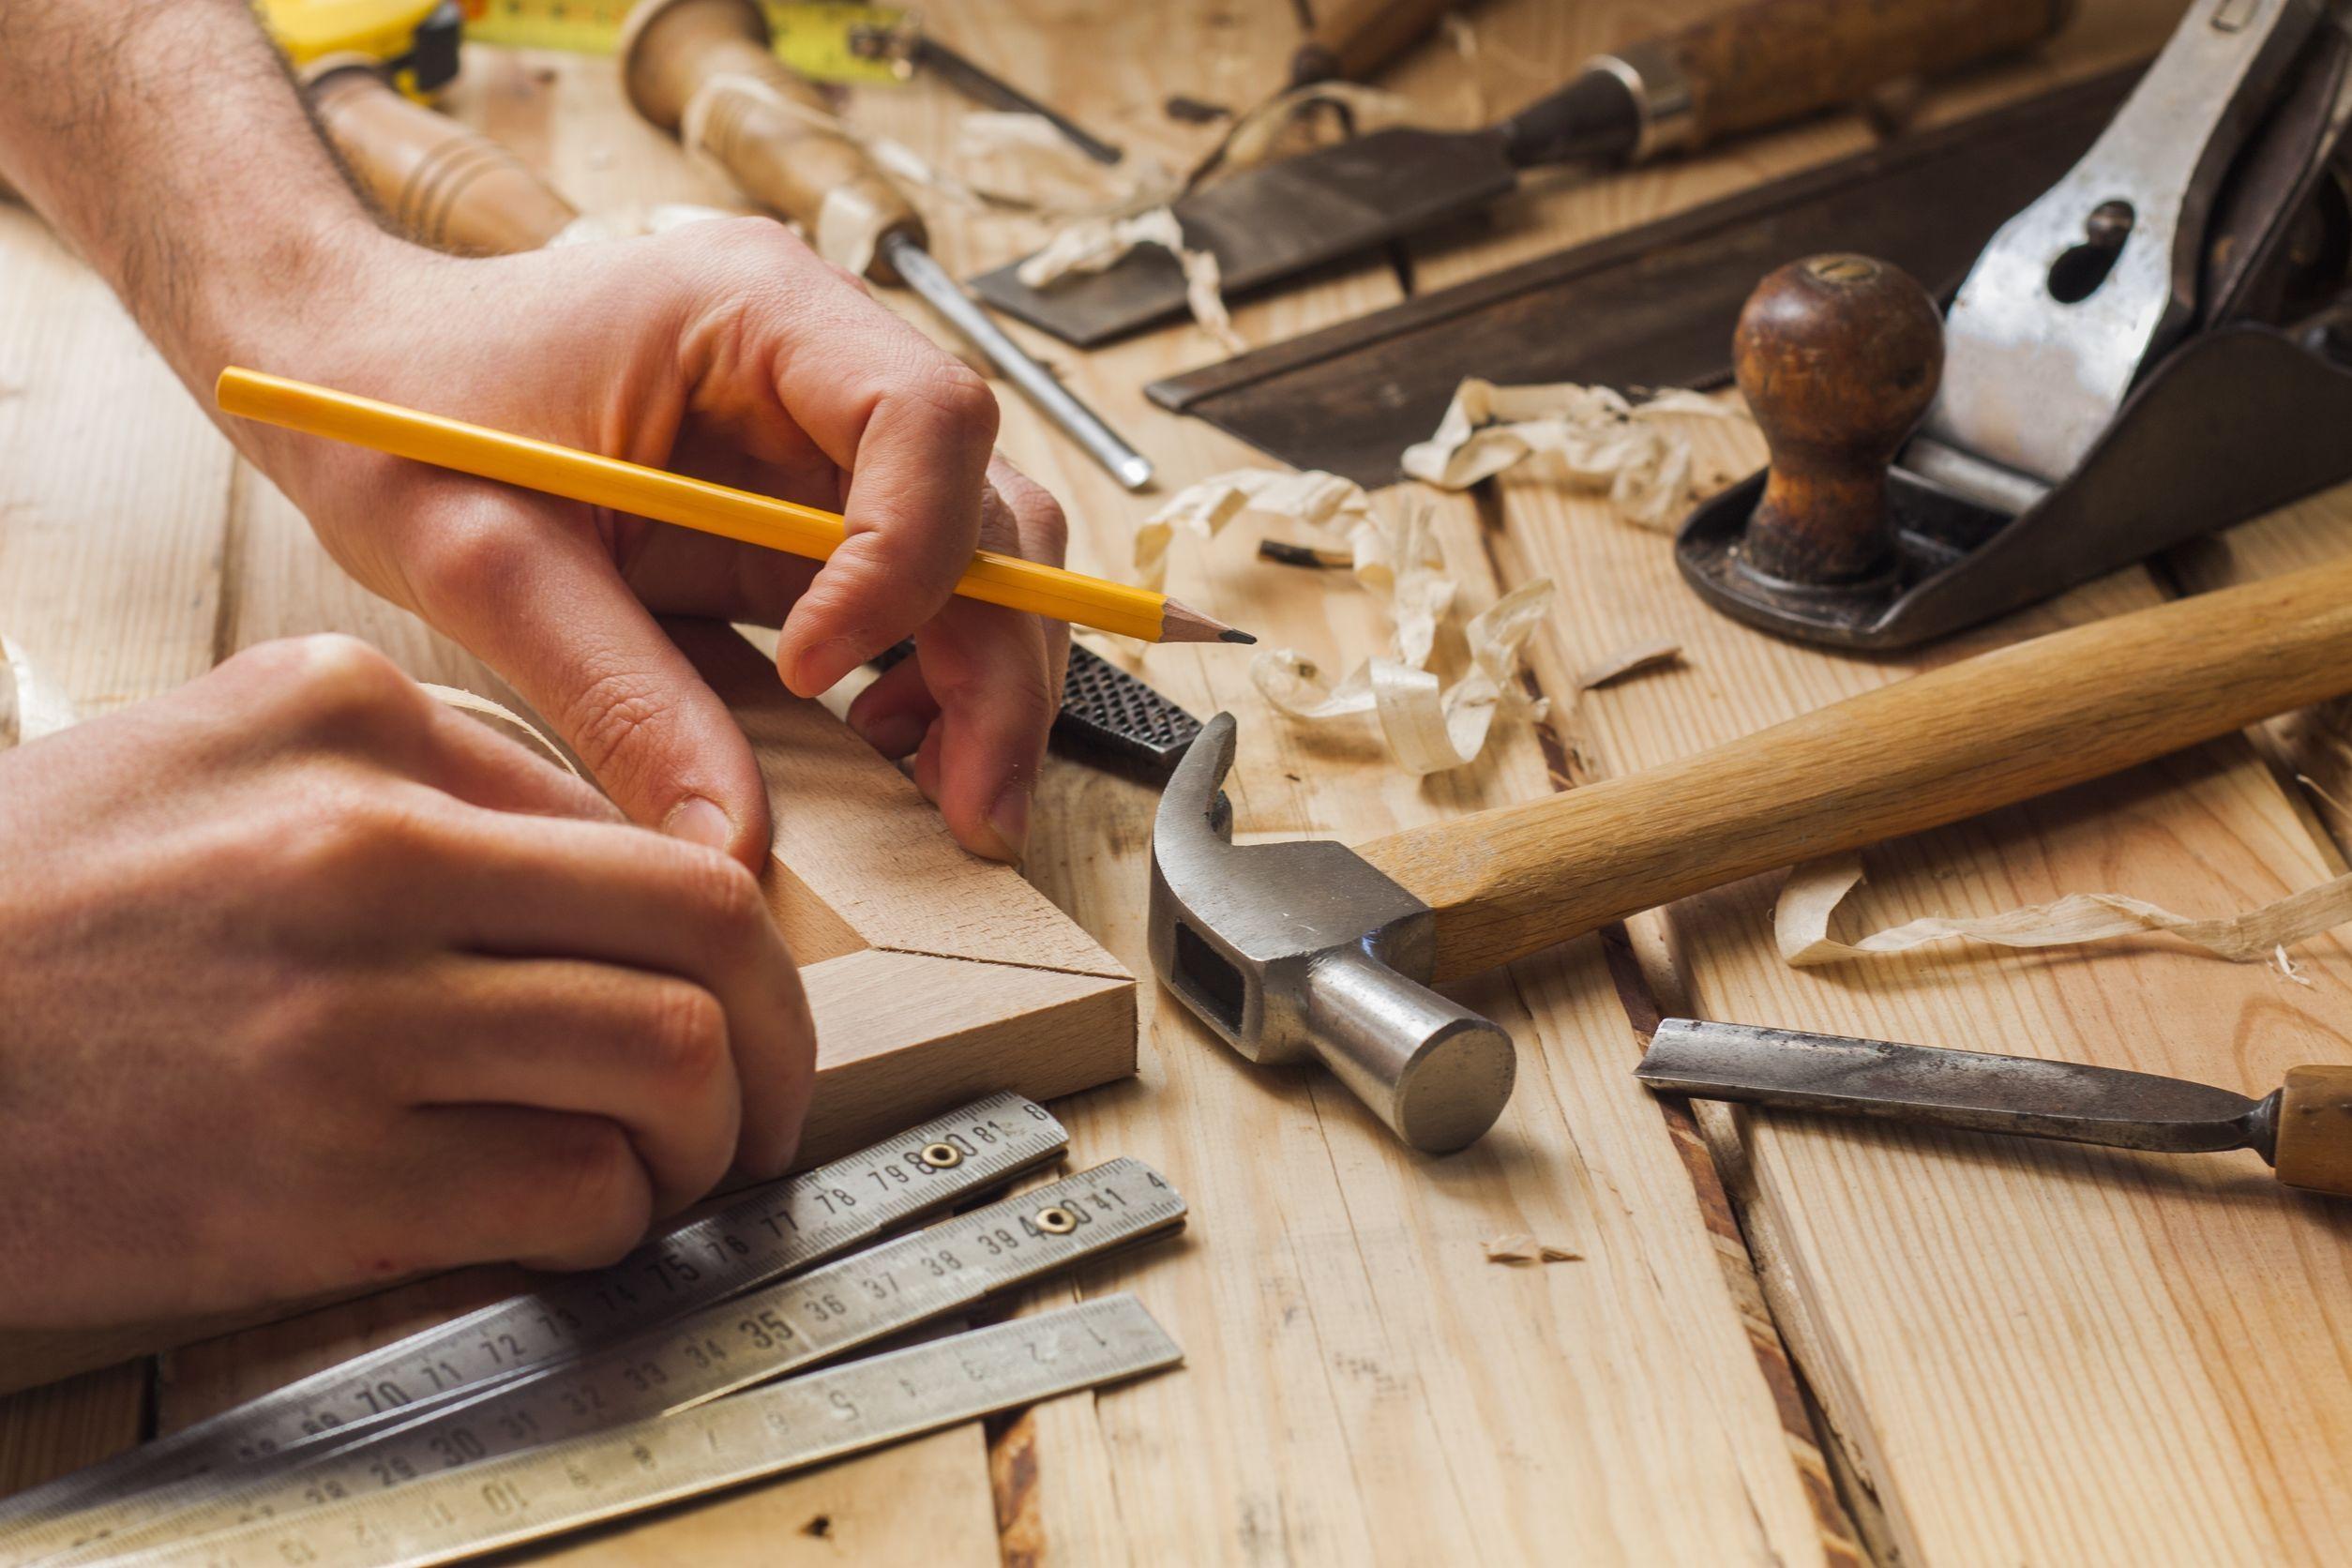 JD Ene Todo lo que necesitas saber para montar un taller de carpintería en casa